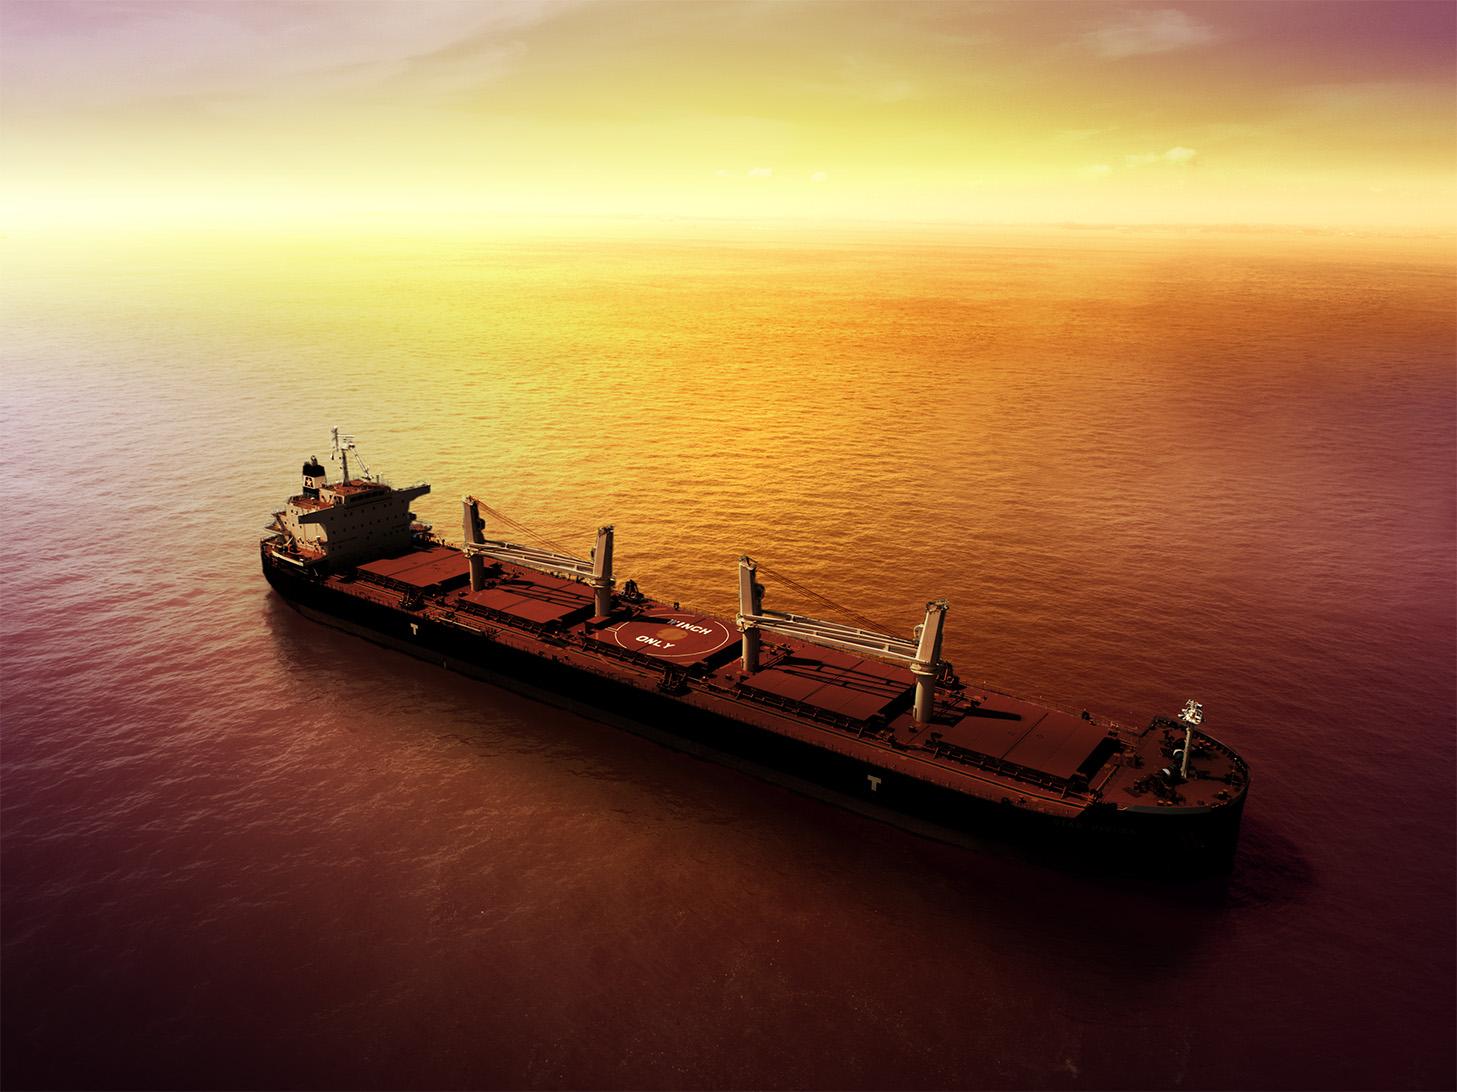 sunset vessel1.jpg